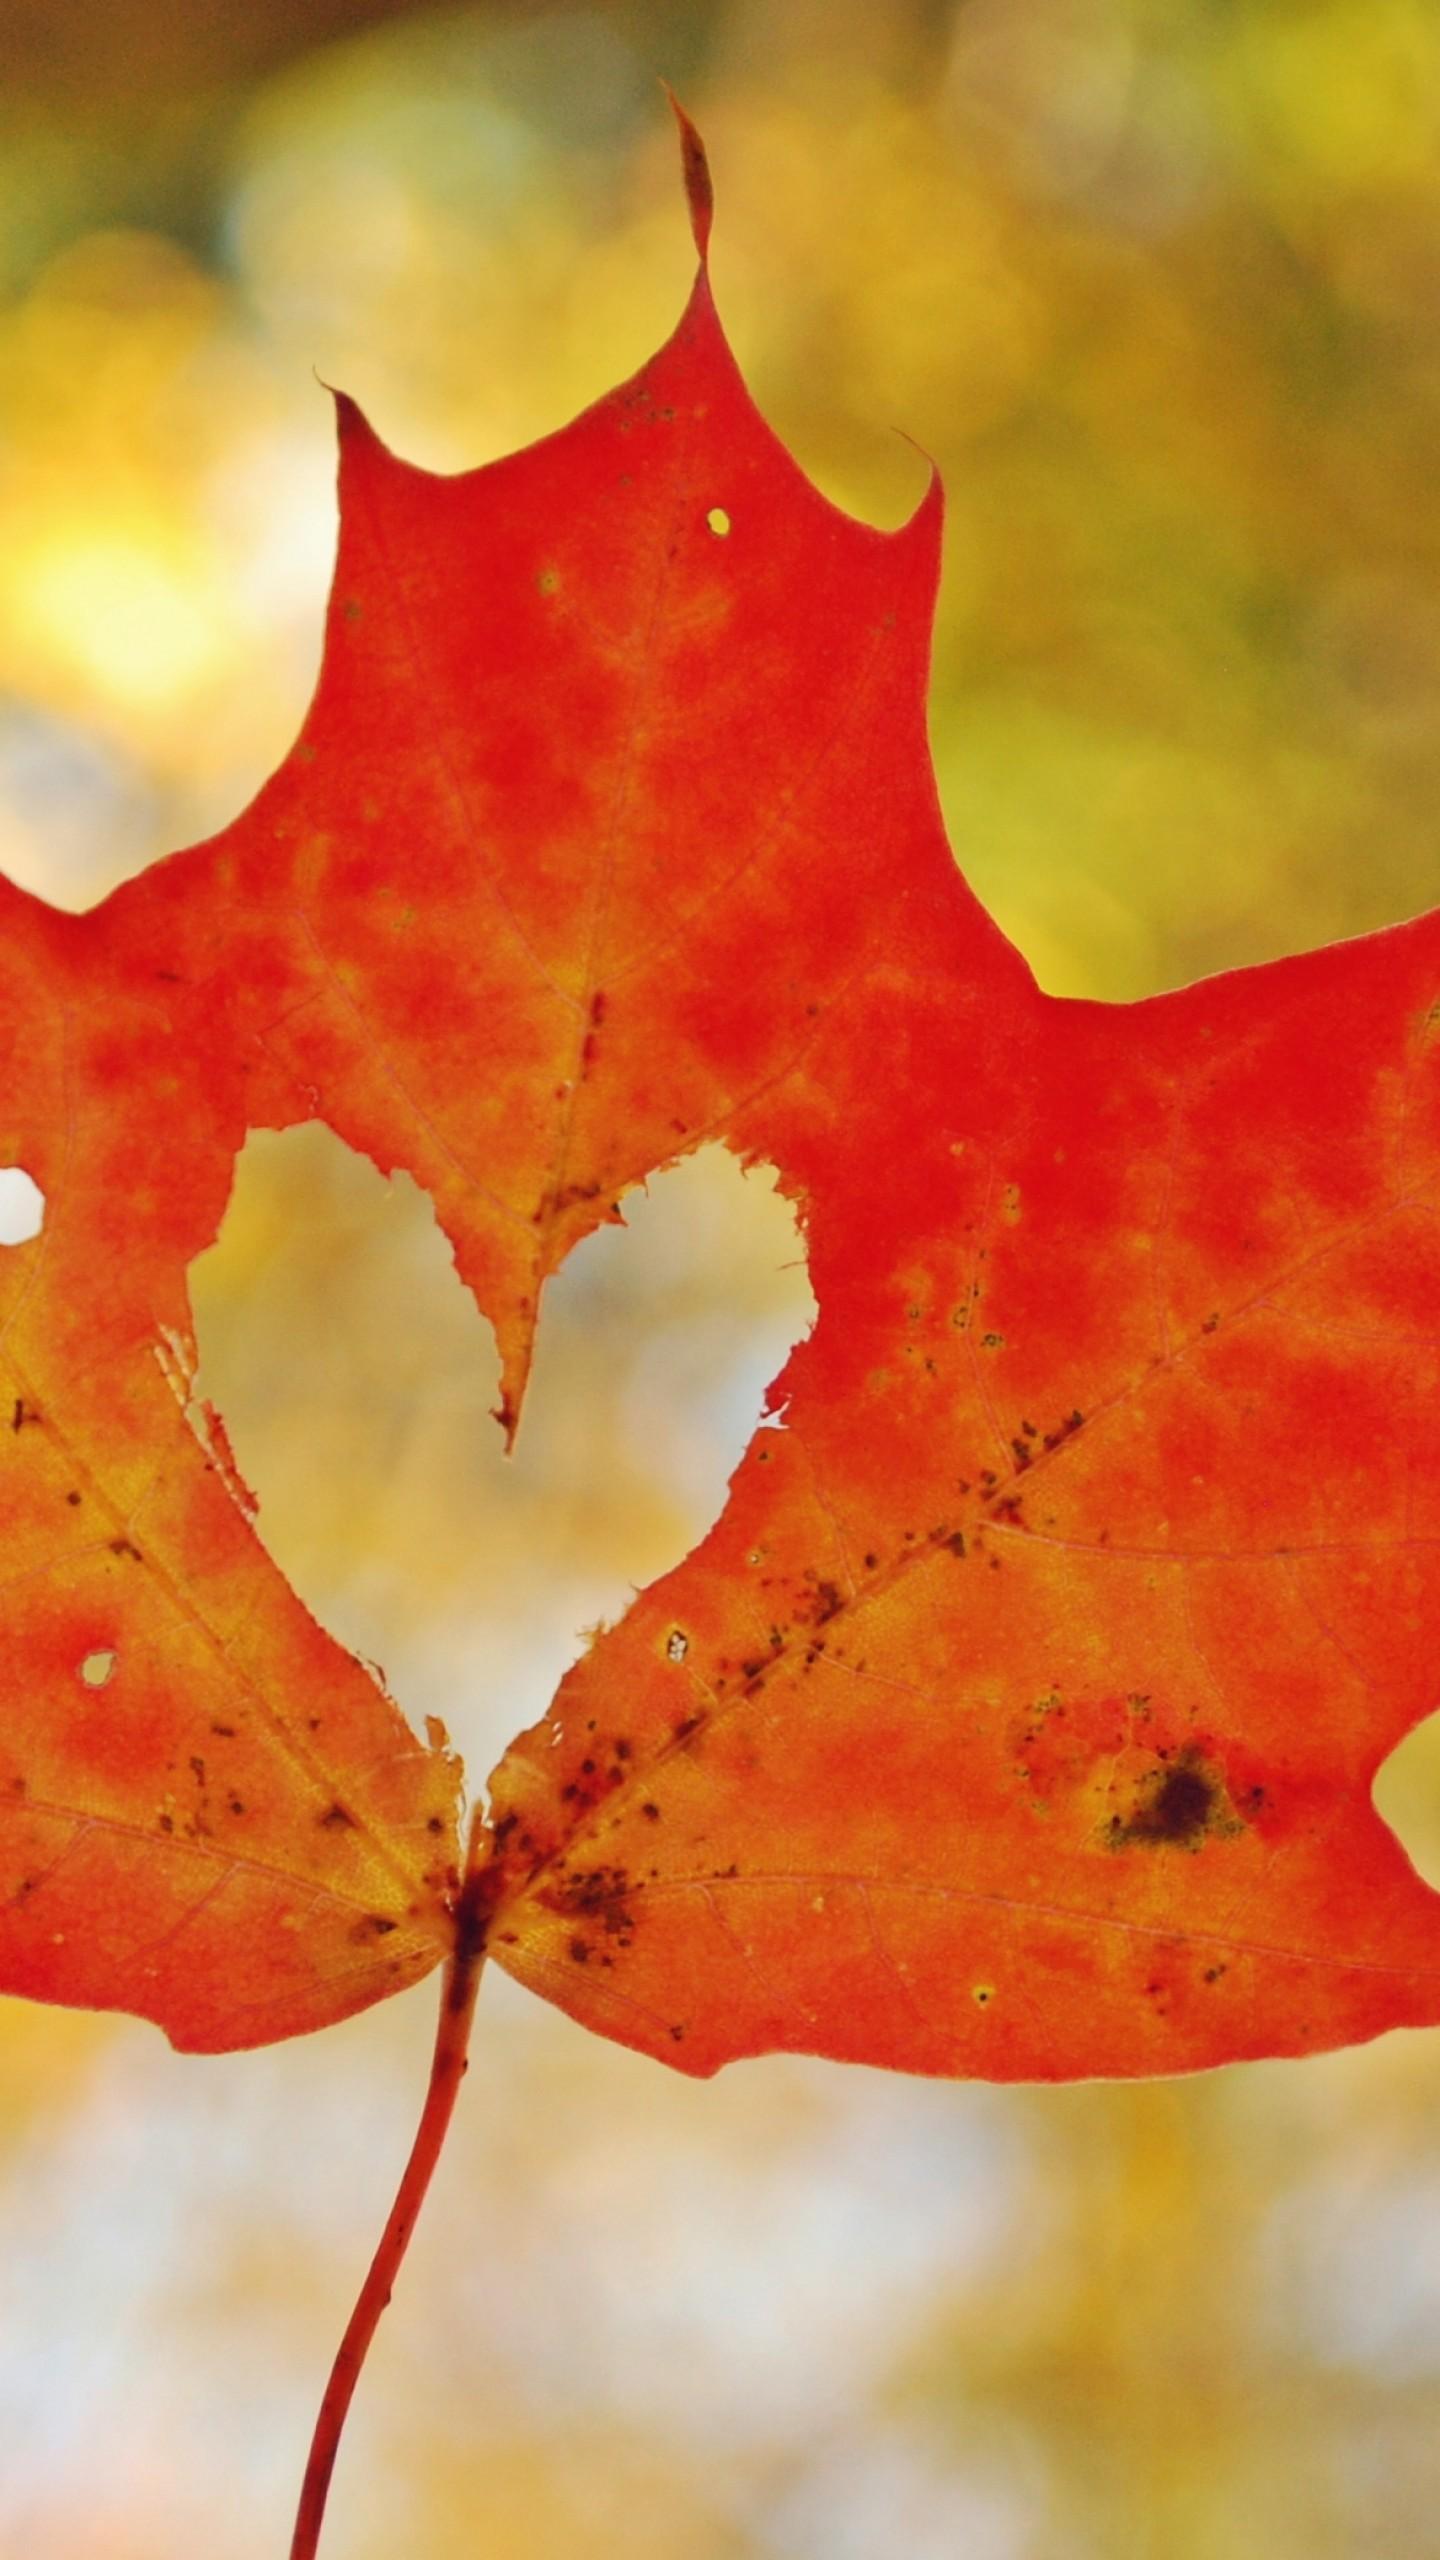 عکس زمینه برگ پاییزی به شکل قلب پس زمینه